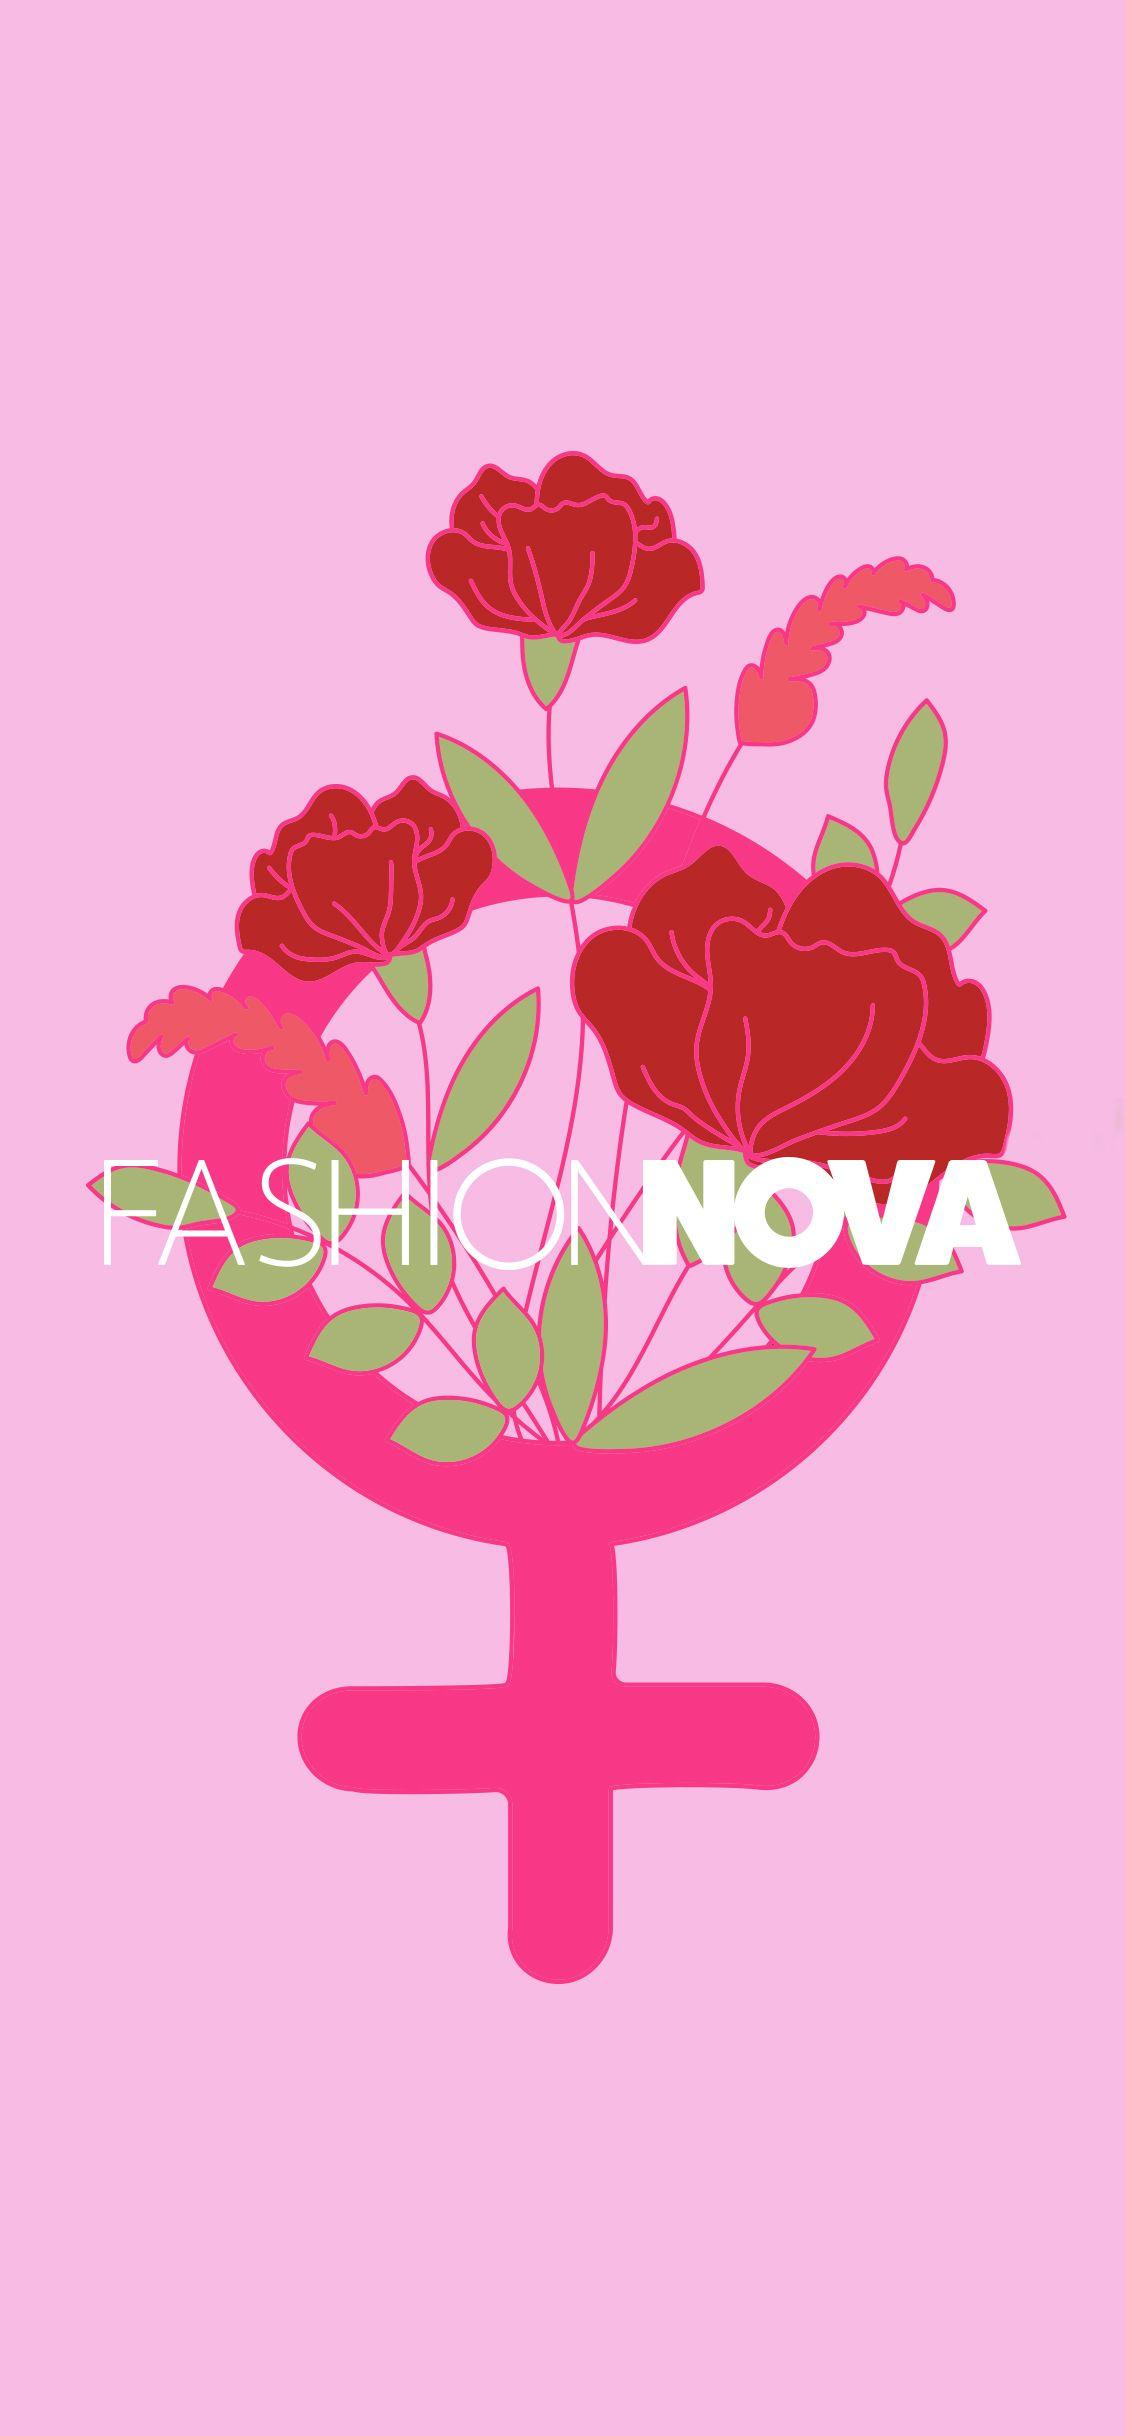 Fashion nova logo clipart clip art black and white download A wallpaper displaying the standard female venus symbol | Social ... clip art black and white download